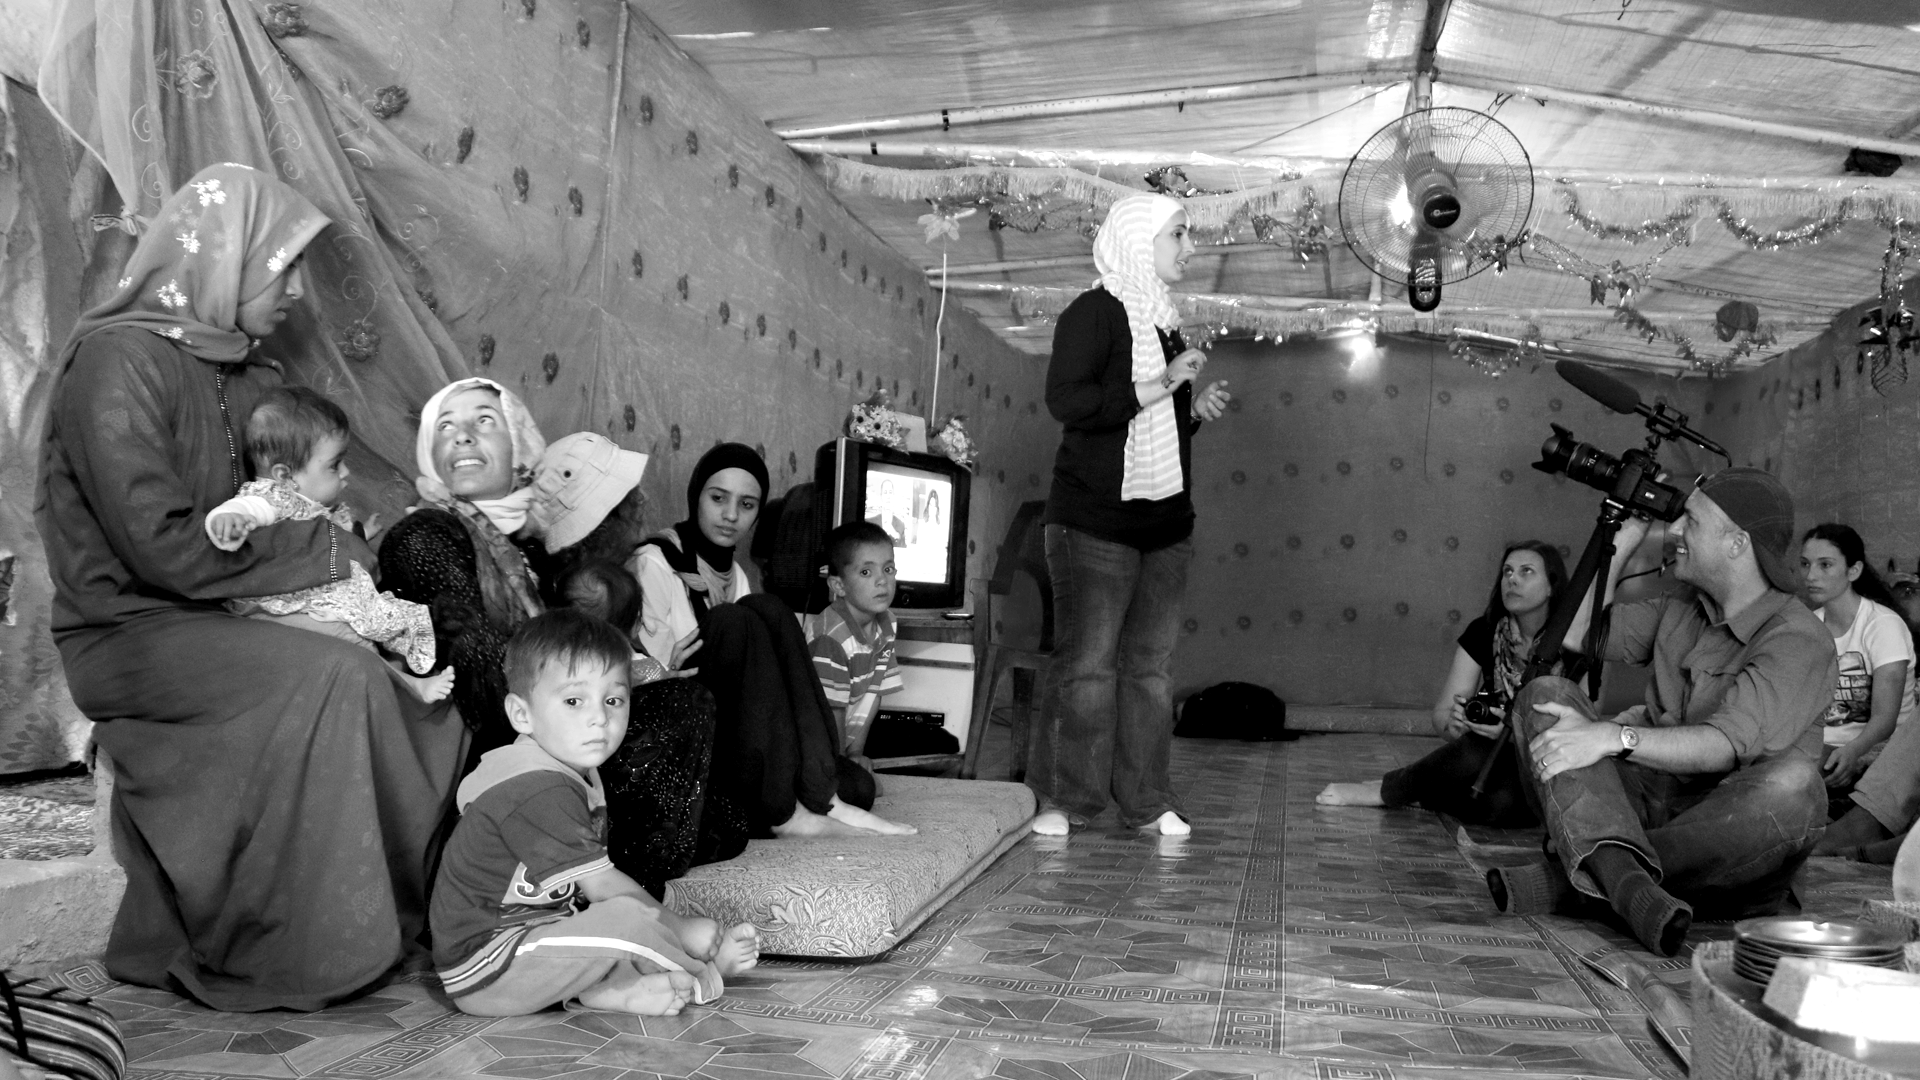 Filmmaker Dan Evans working with Syrian refugees in northern Jordan